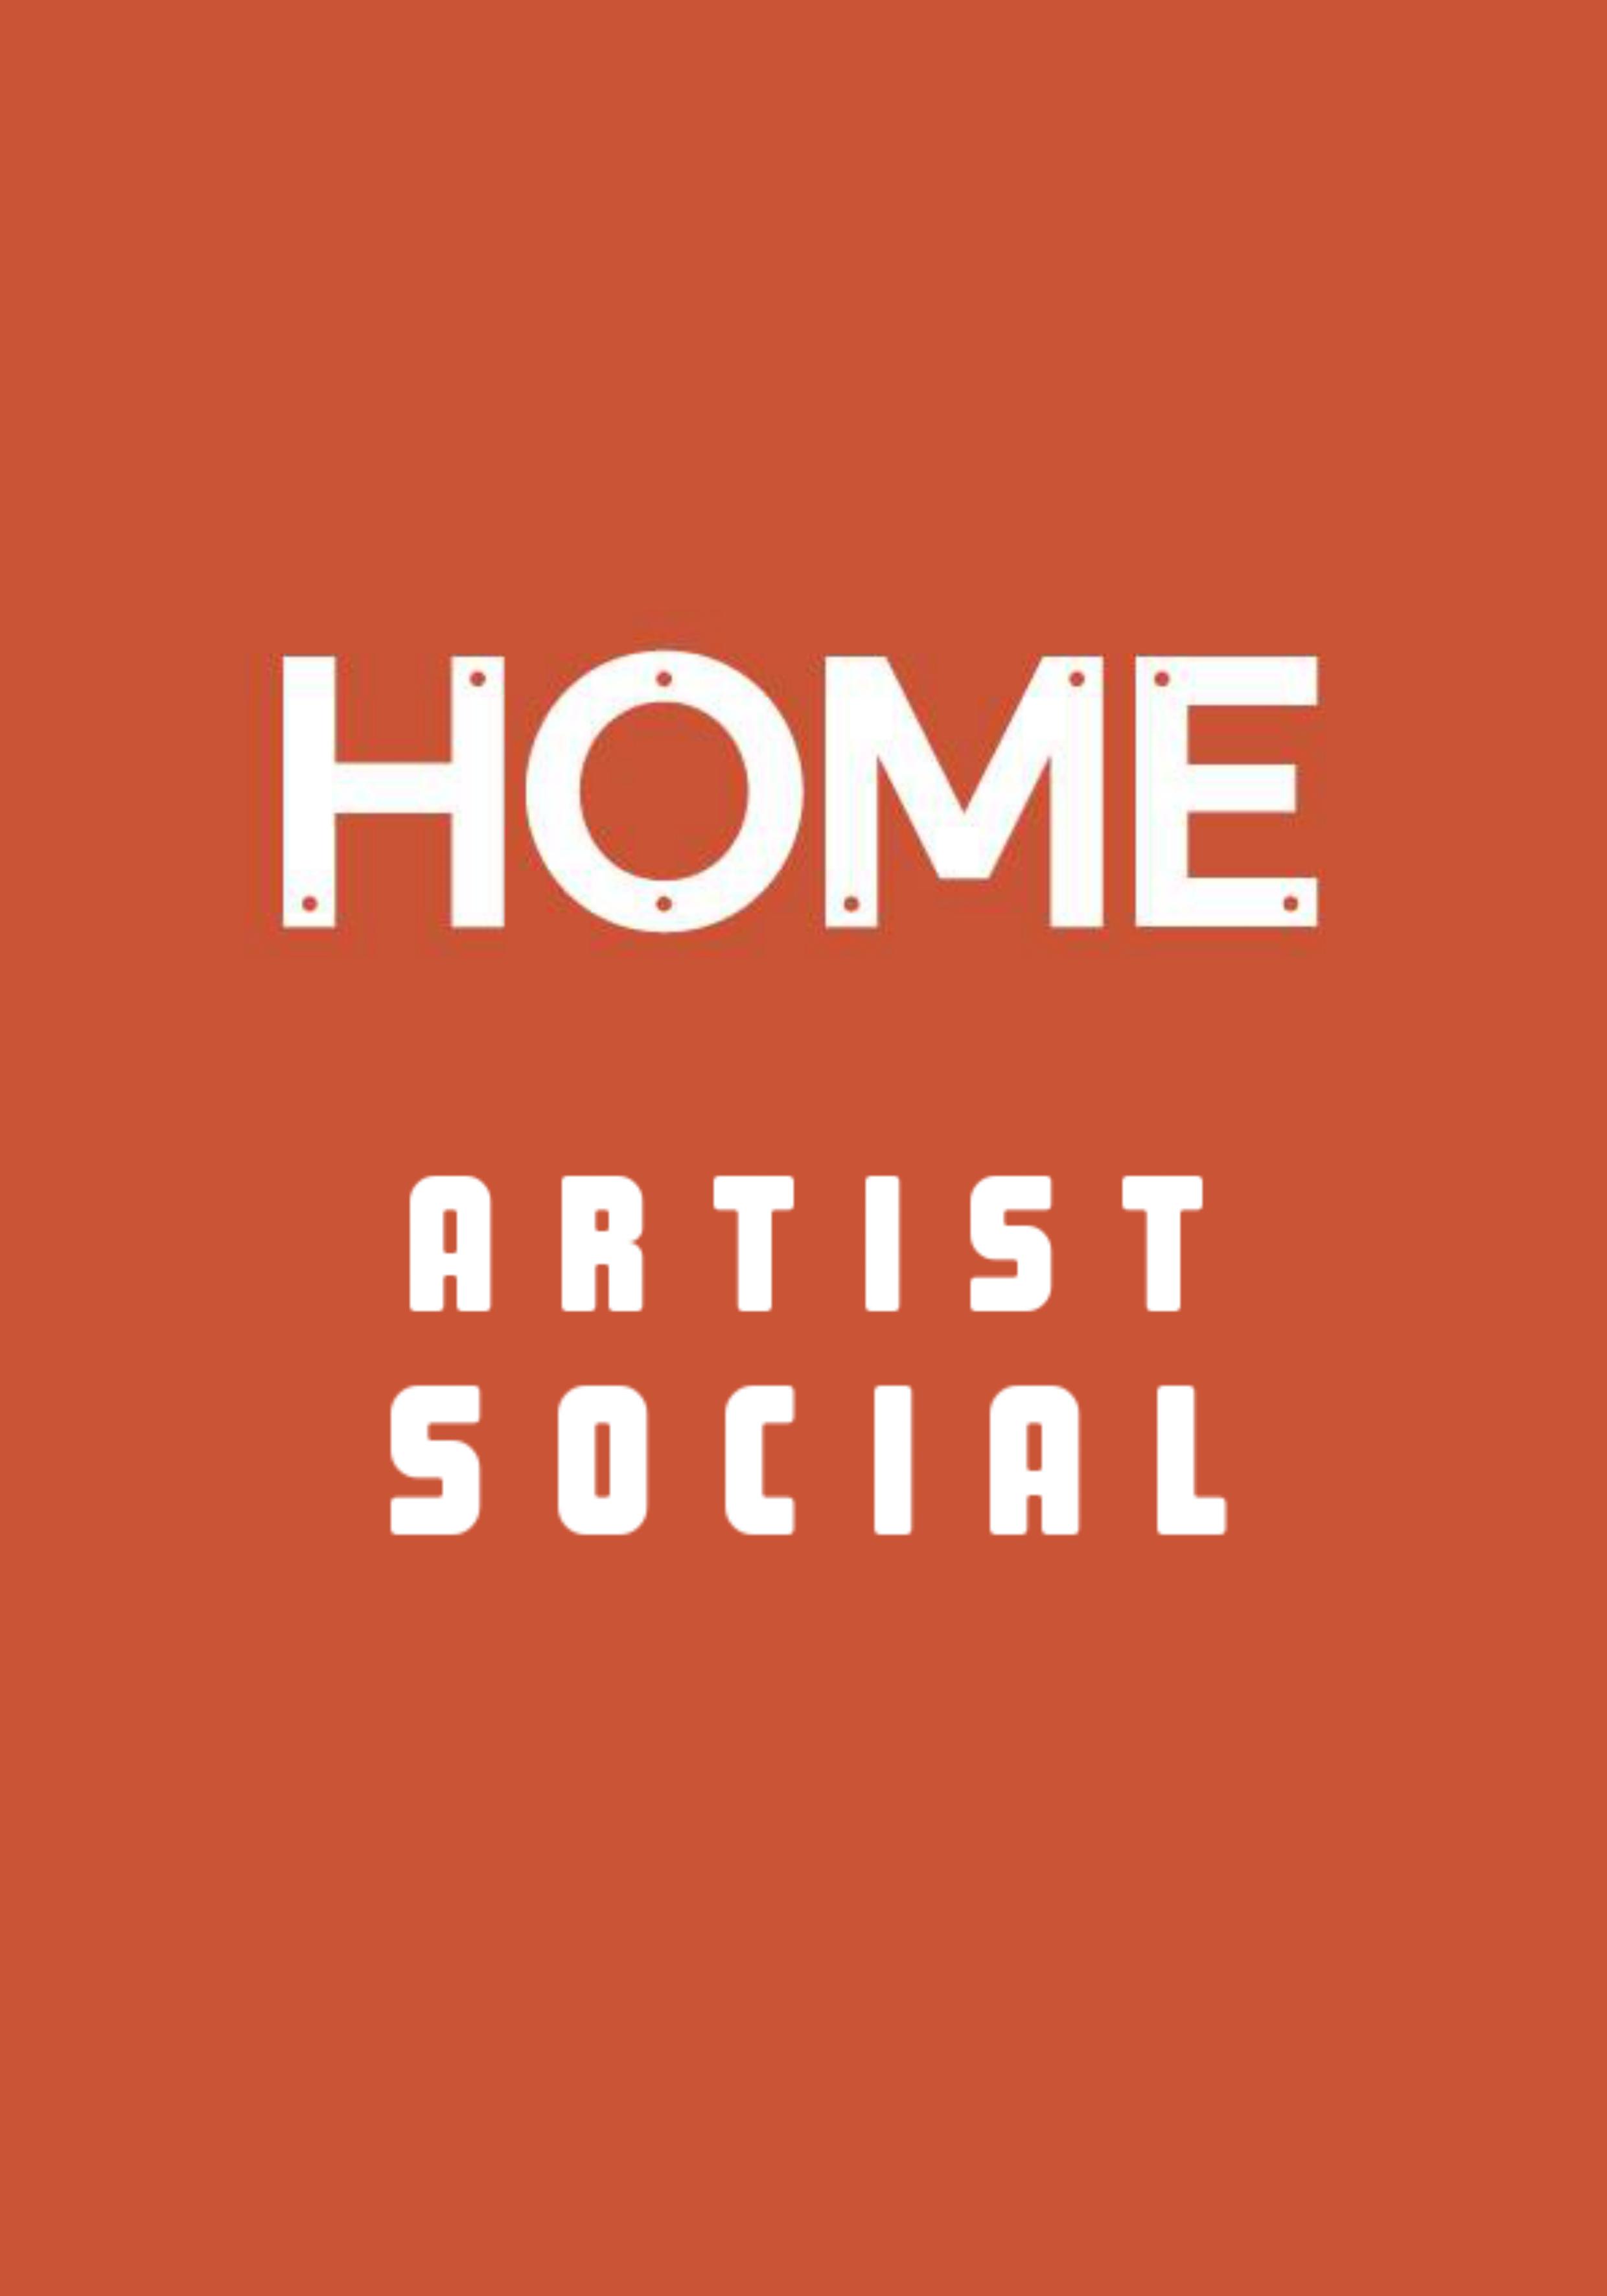 Home Artist Social Event